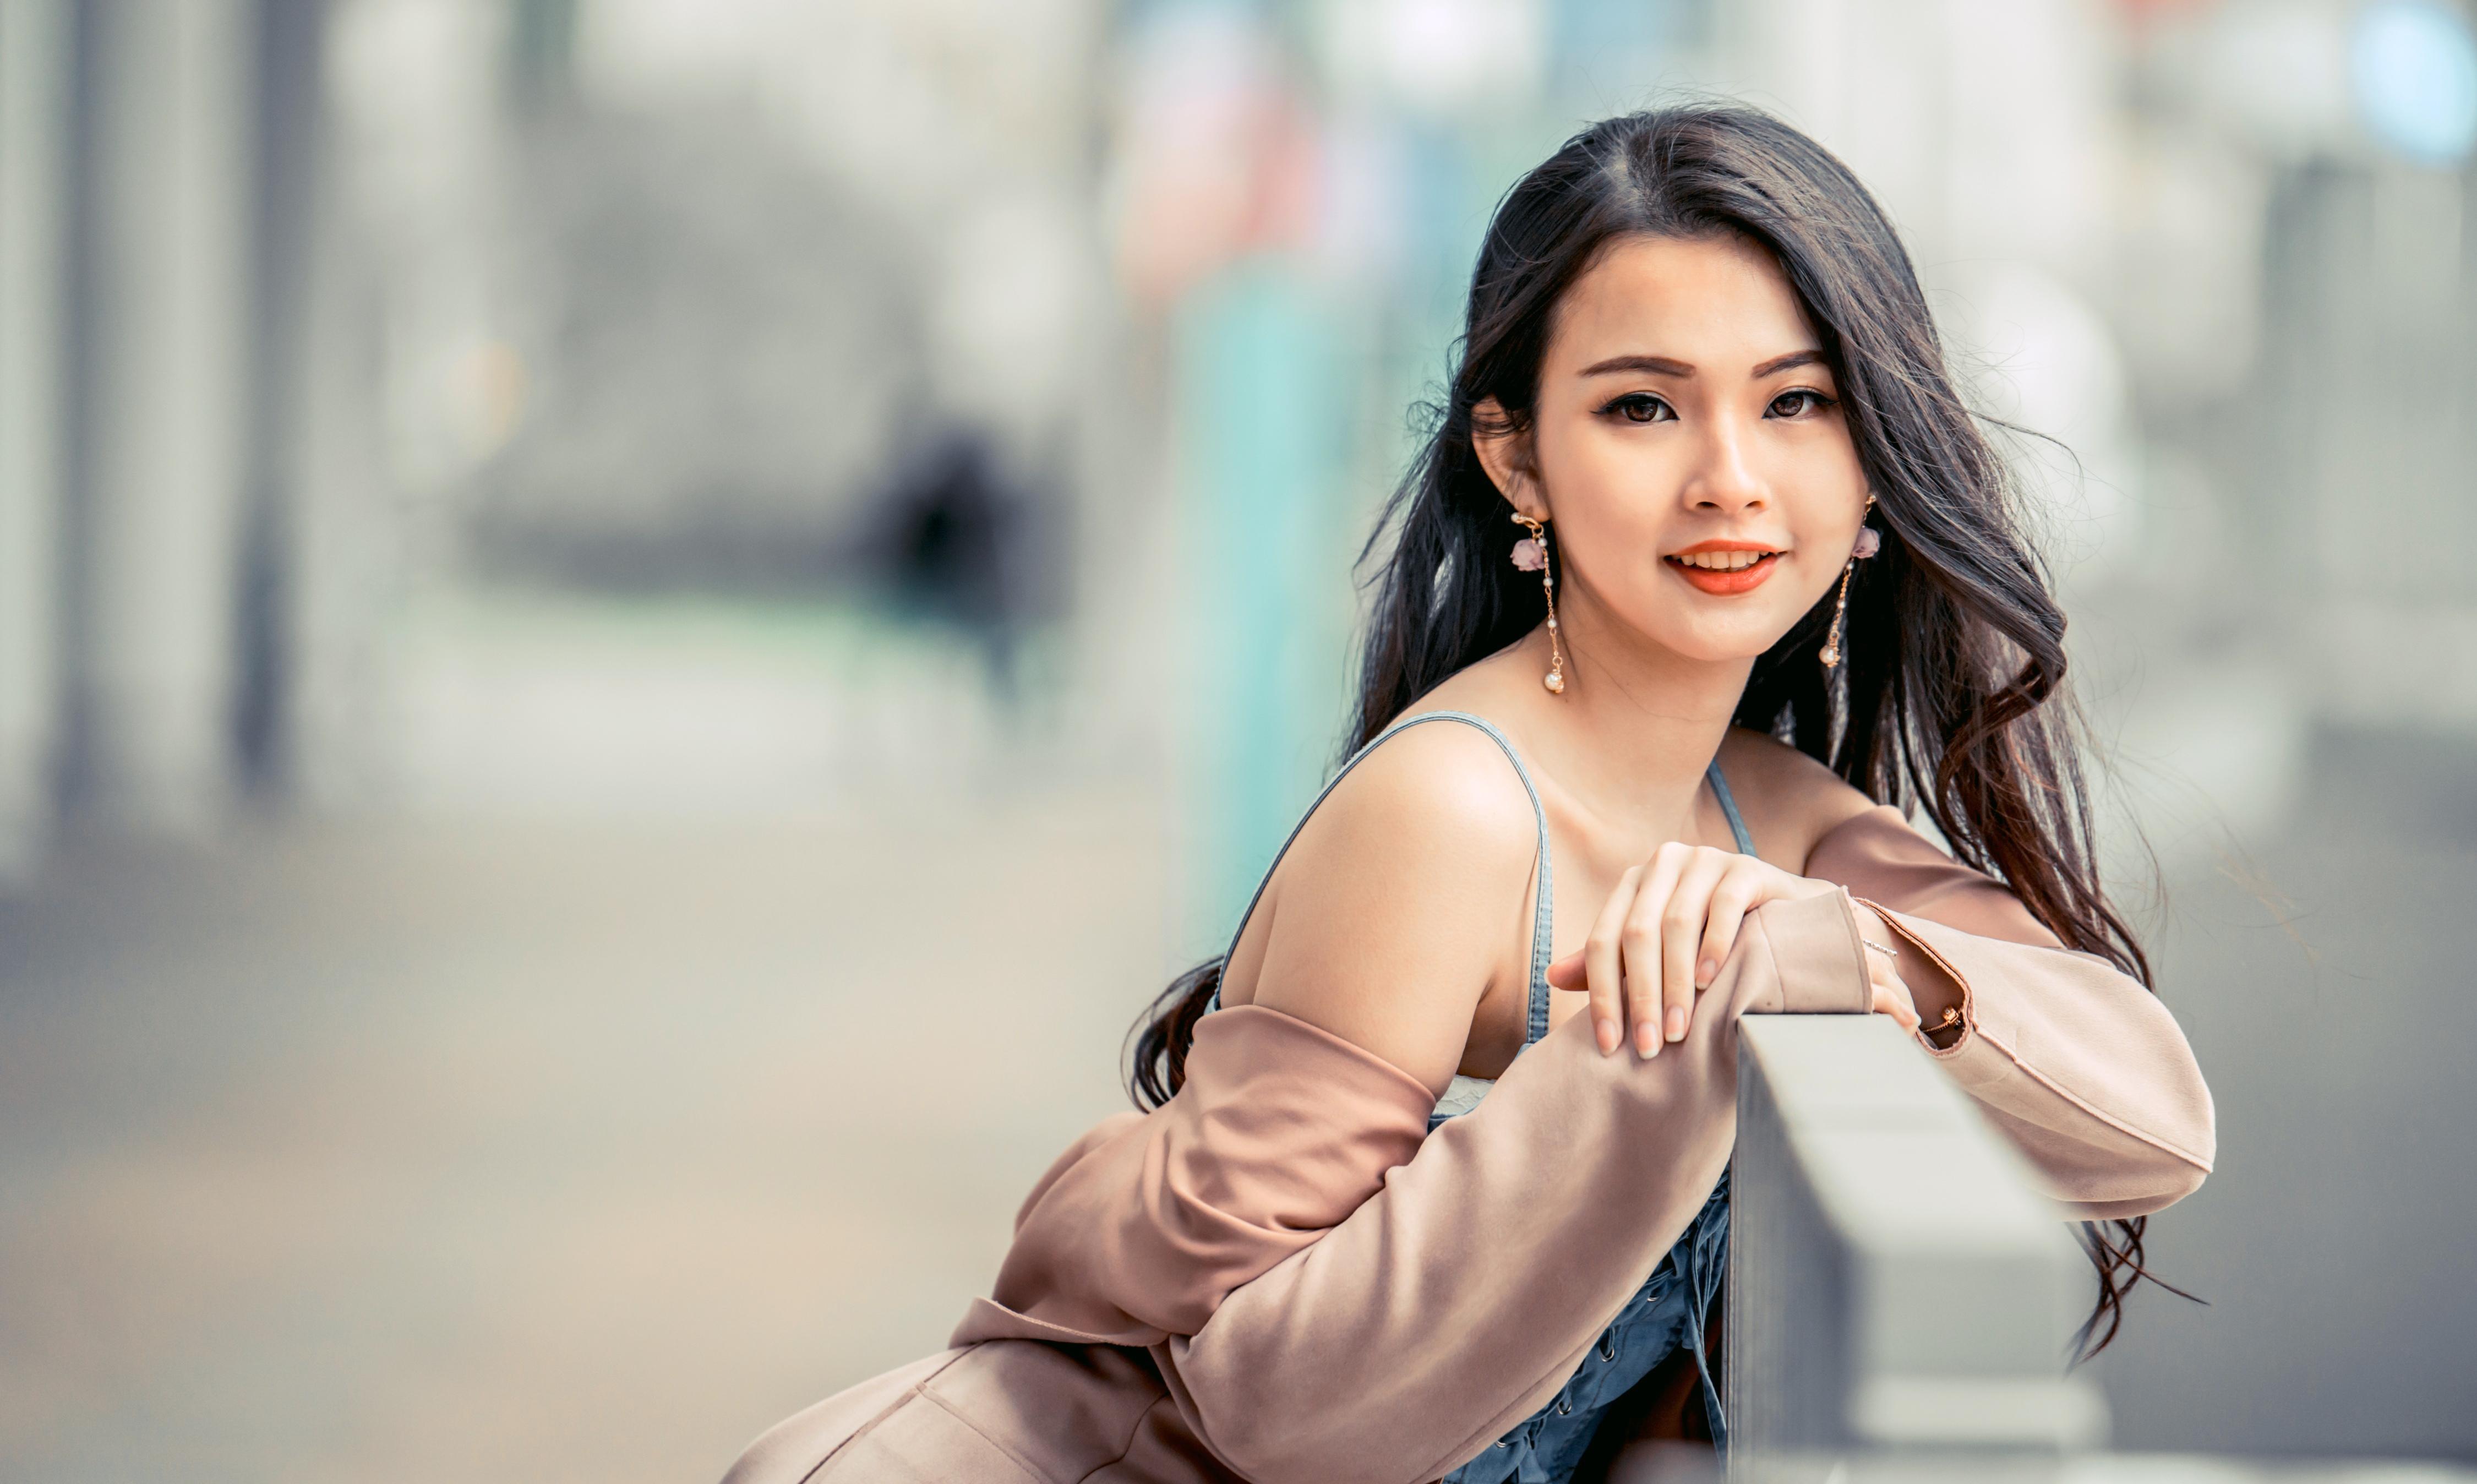 Asian Girl 4k Wallpaper Beautiful Girl Asian Woman Cute 5k People 1541